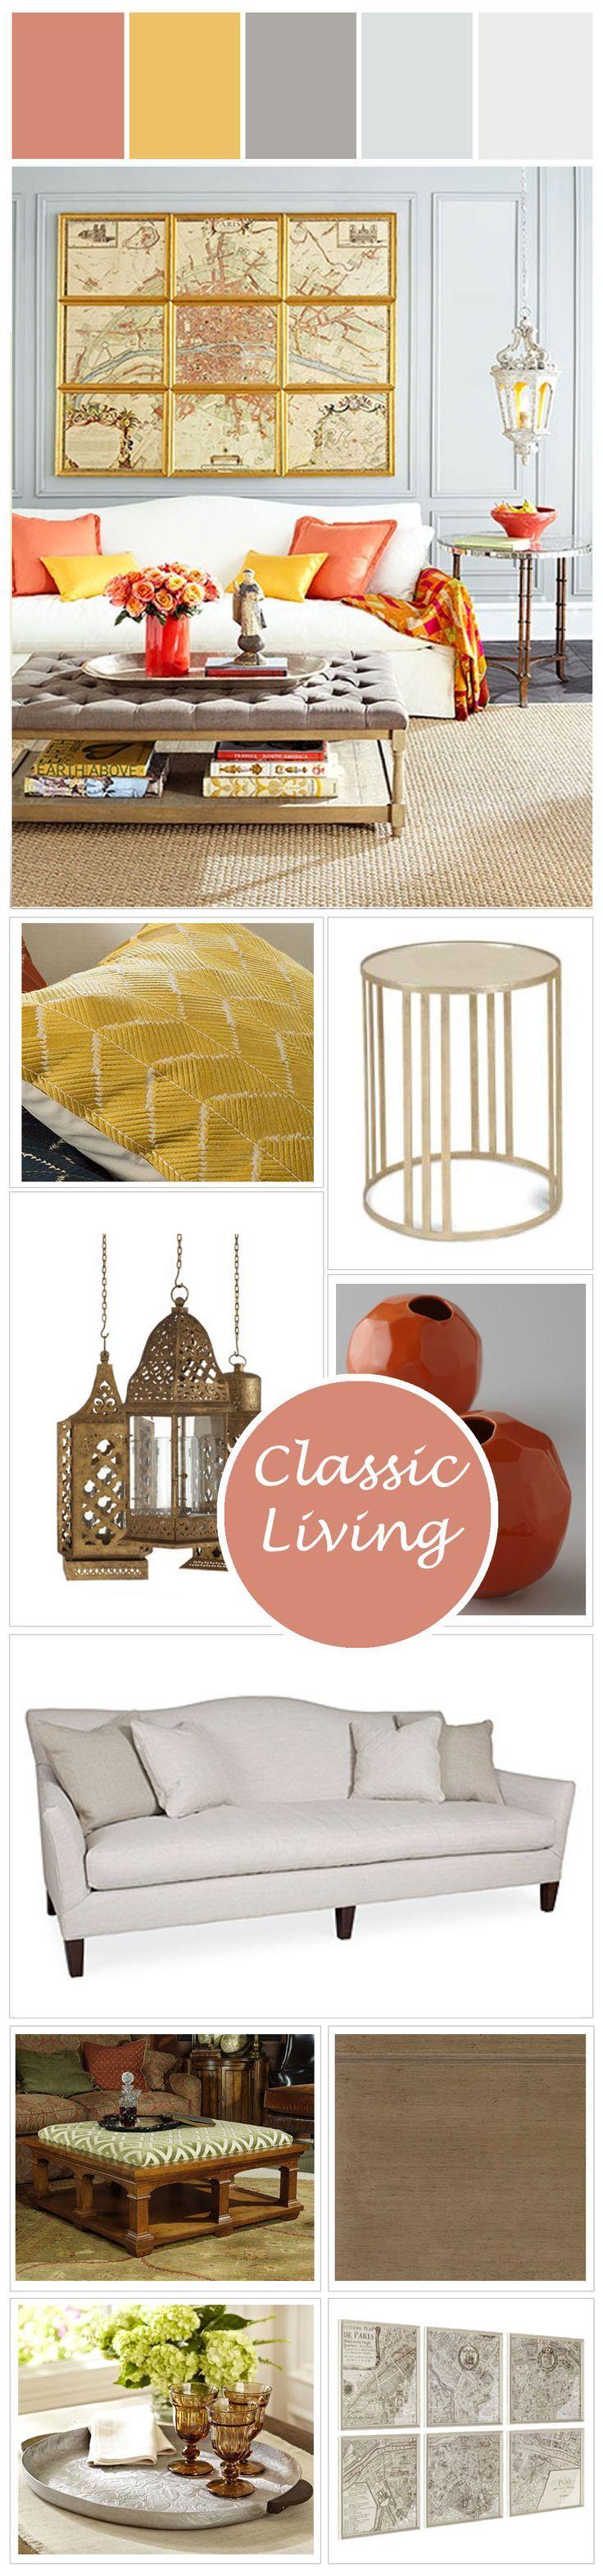 Interior living room color schemes - Interior Living Room Color Schemes 42